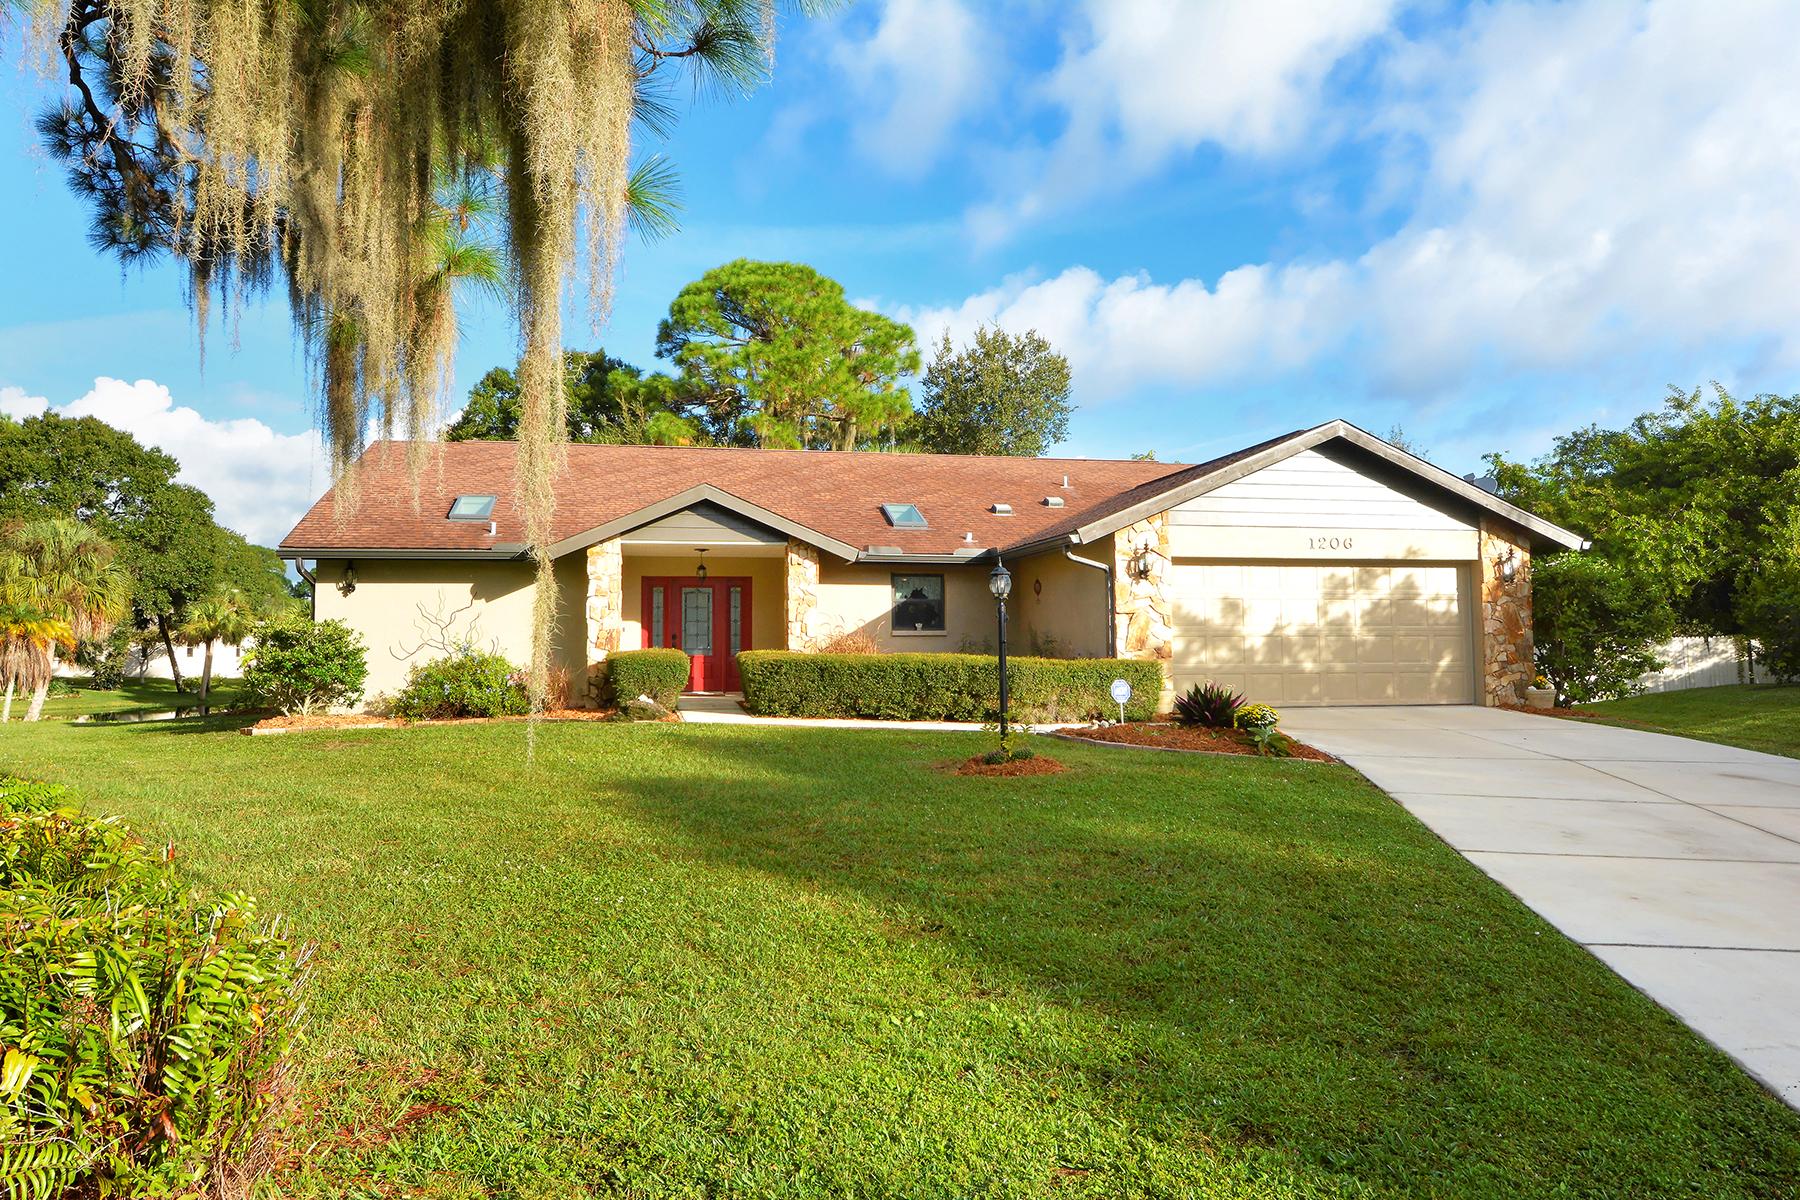 Single Family Home for Sale at LAUREL PINES 1206 Laurel Pines Cir Nokomis, Florida 34275 United States